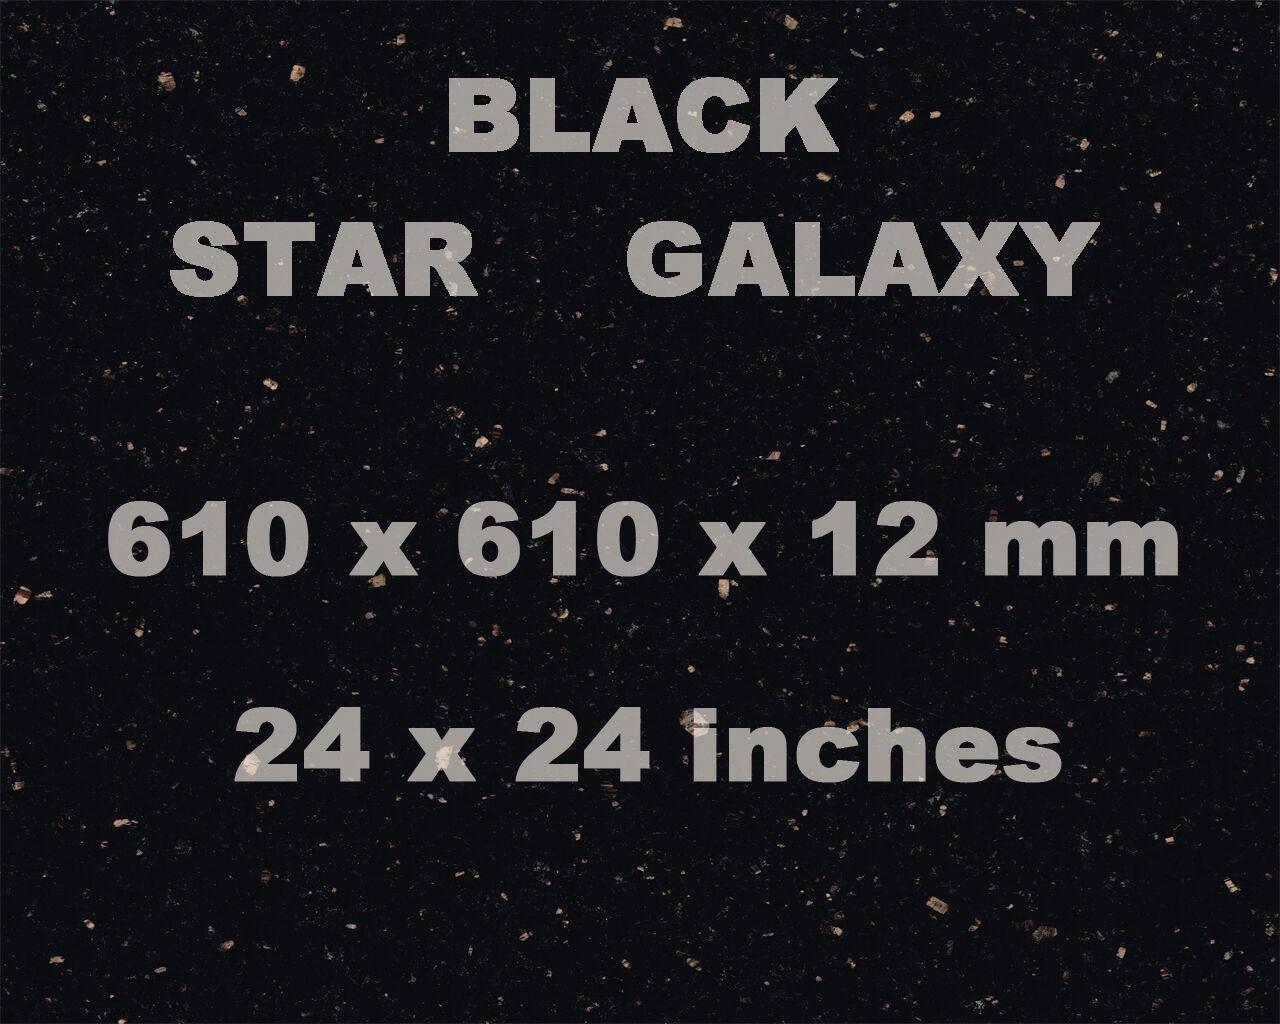 Black star galaxy granite wall floor tiles goldcopper fleck black star galaxy granite wall floor tiles goldcopper fleck 30x30 2999 m2 dailygadgetfo Images